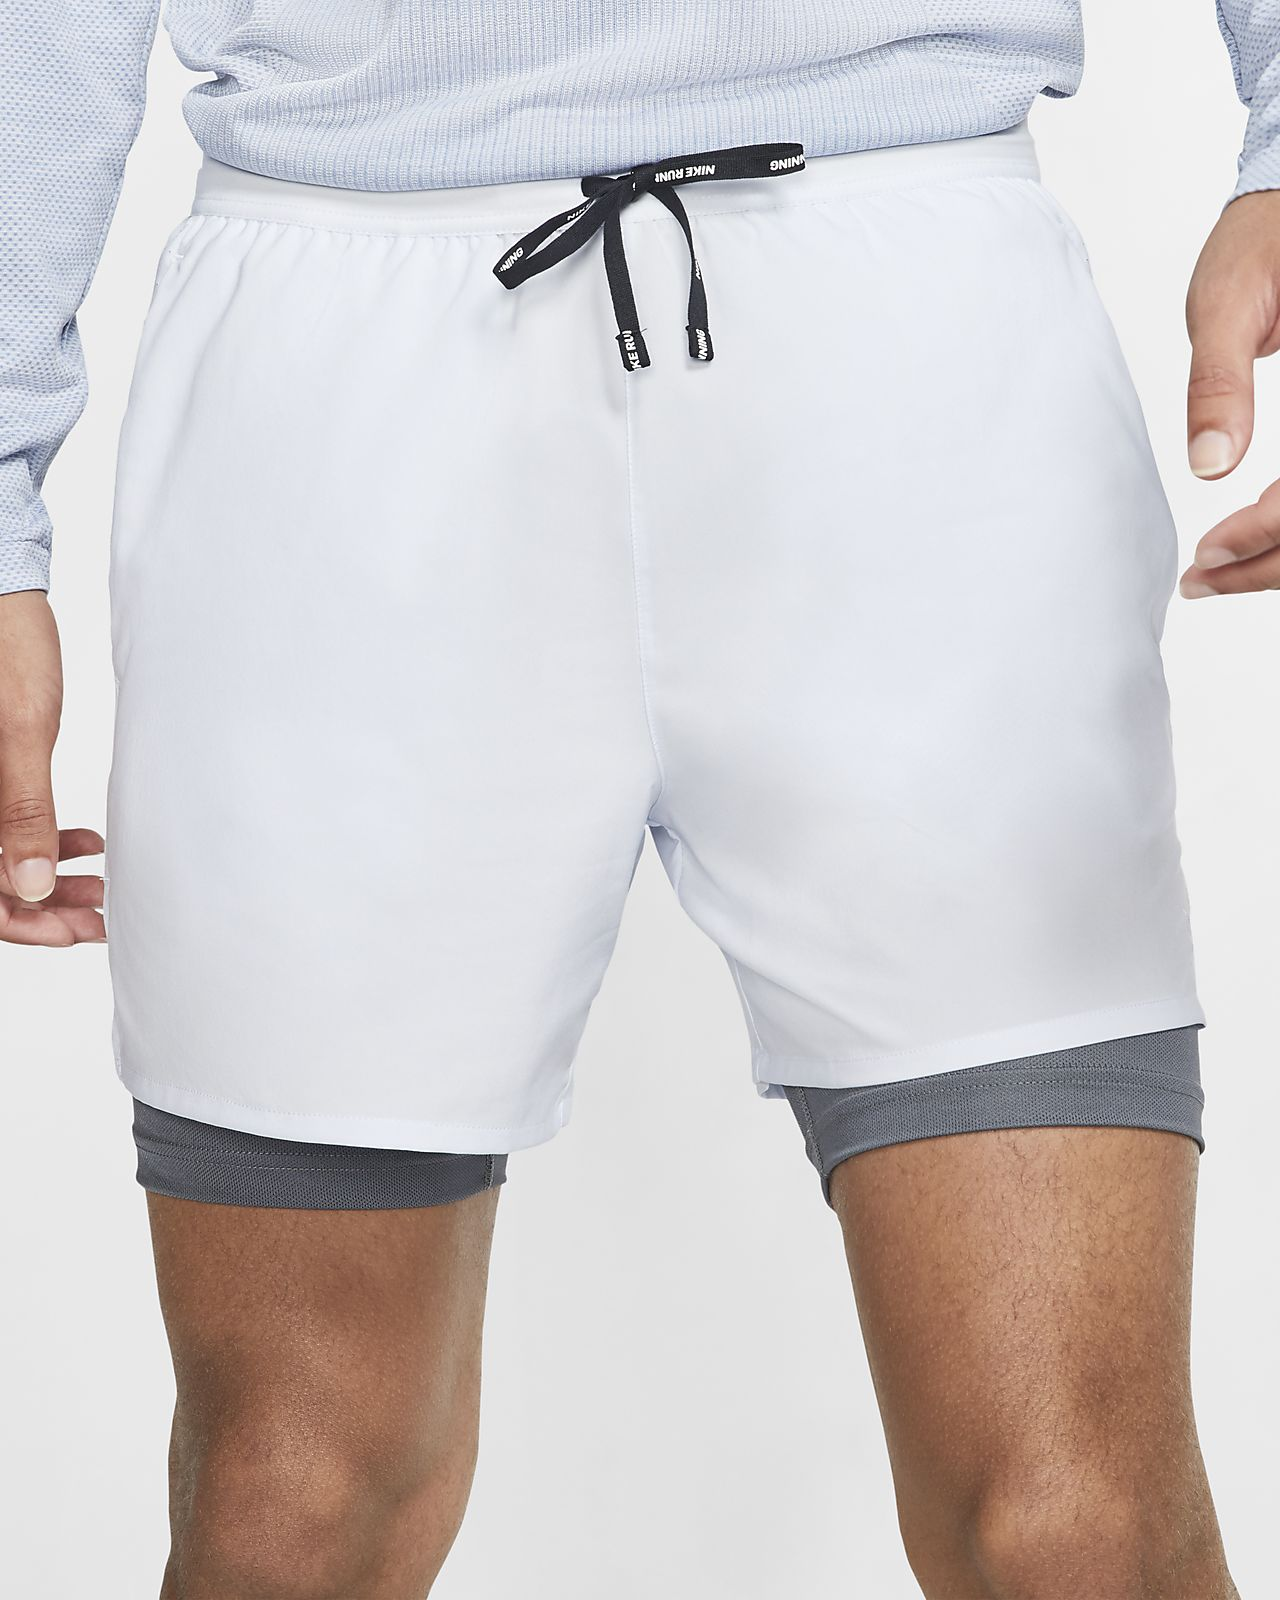 Nike Flex Stride 2-in-1 hardloopshorts voor heren (13 cm)